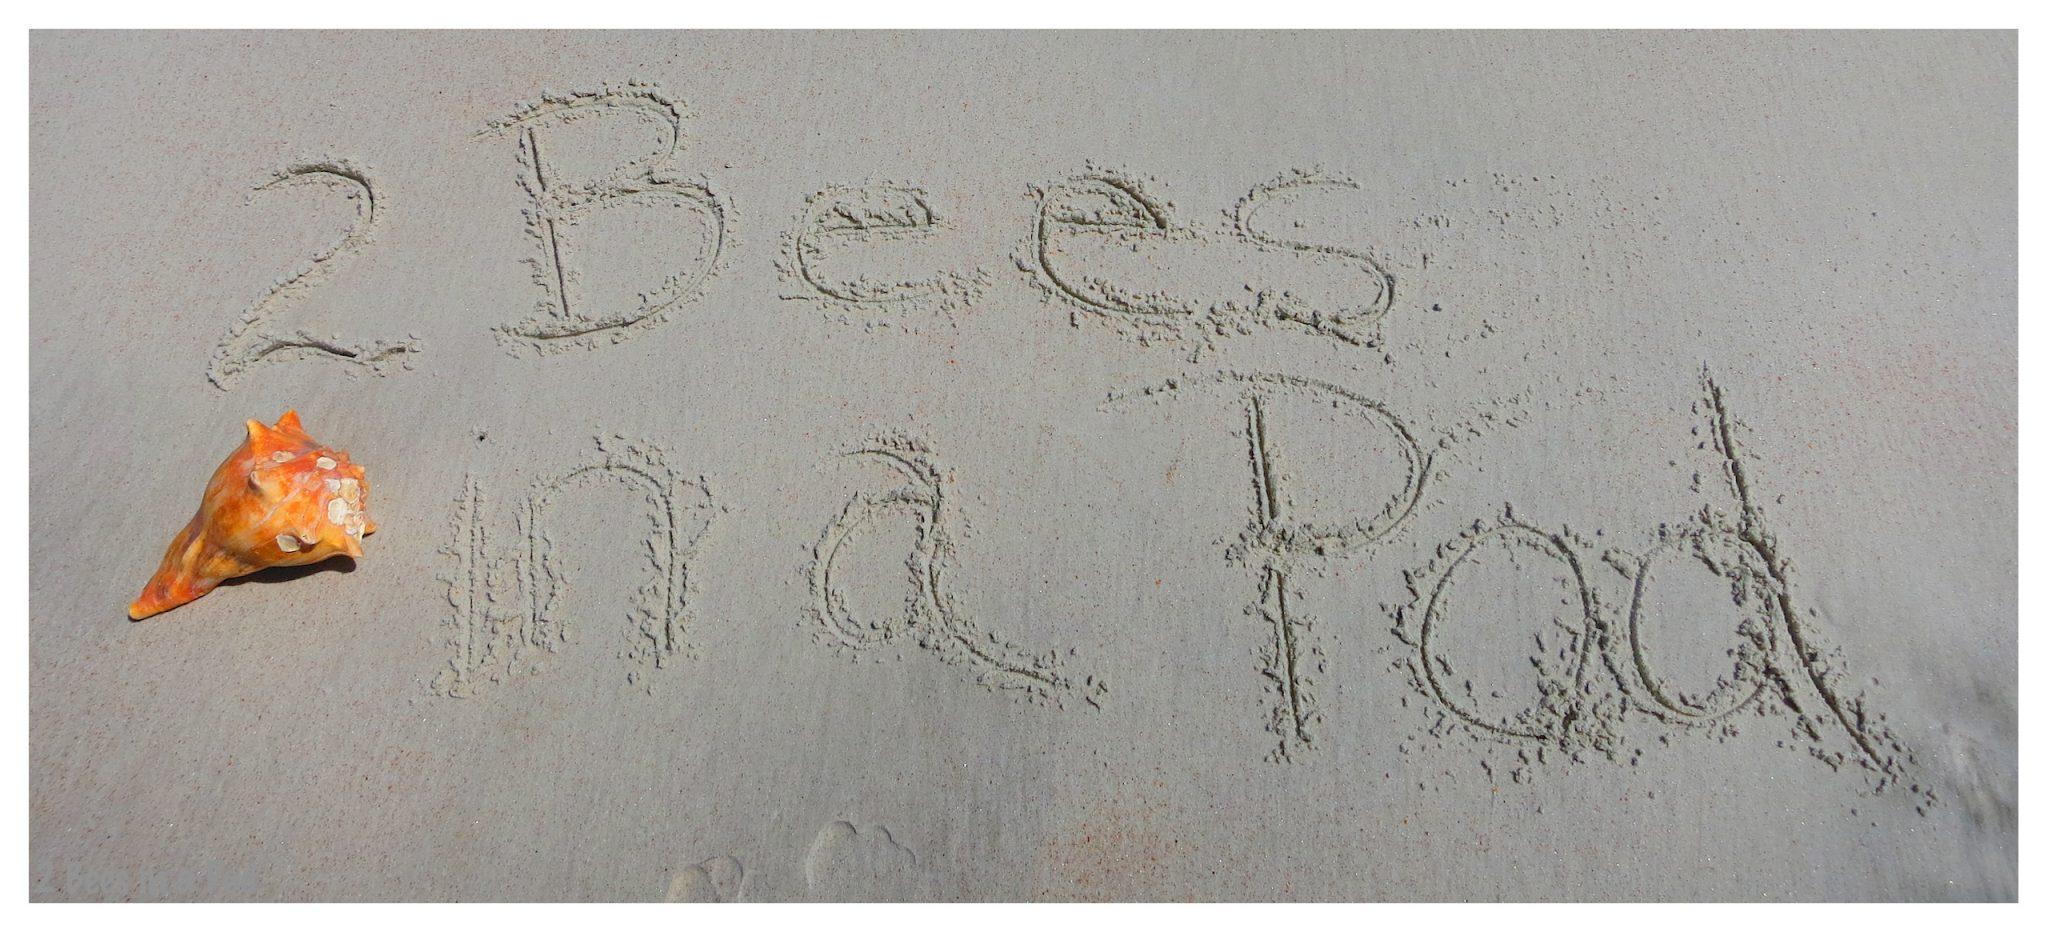 … on Crescent Beach